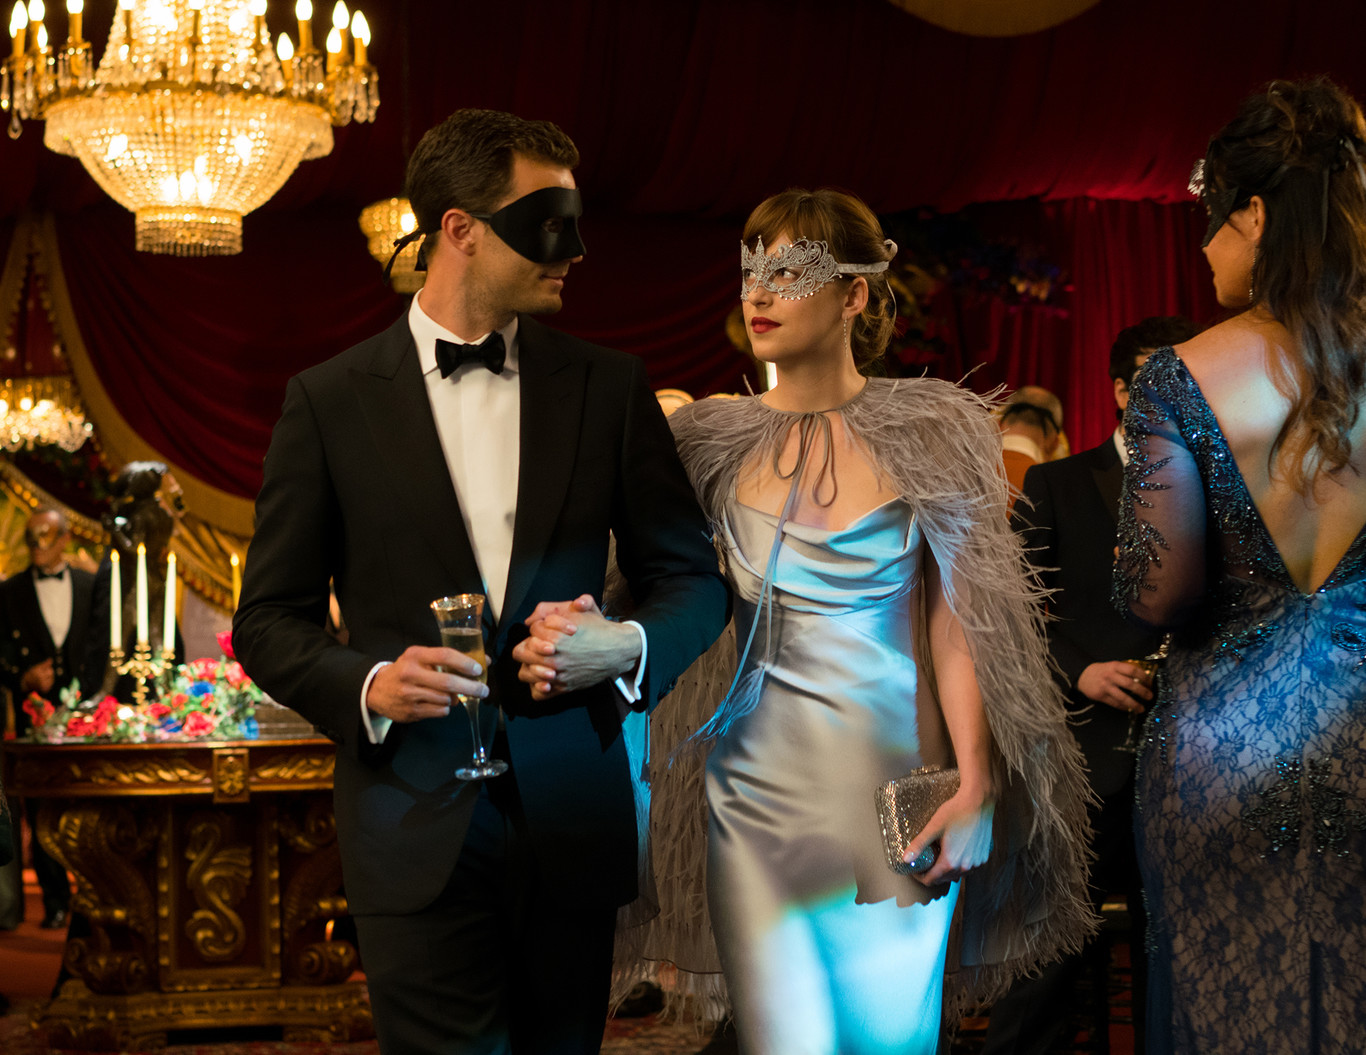 vestidos de películas de Hollywood Dakota Johnson en 50 sombras de Grey